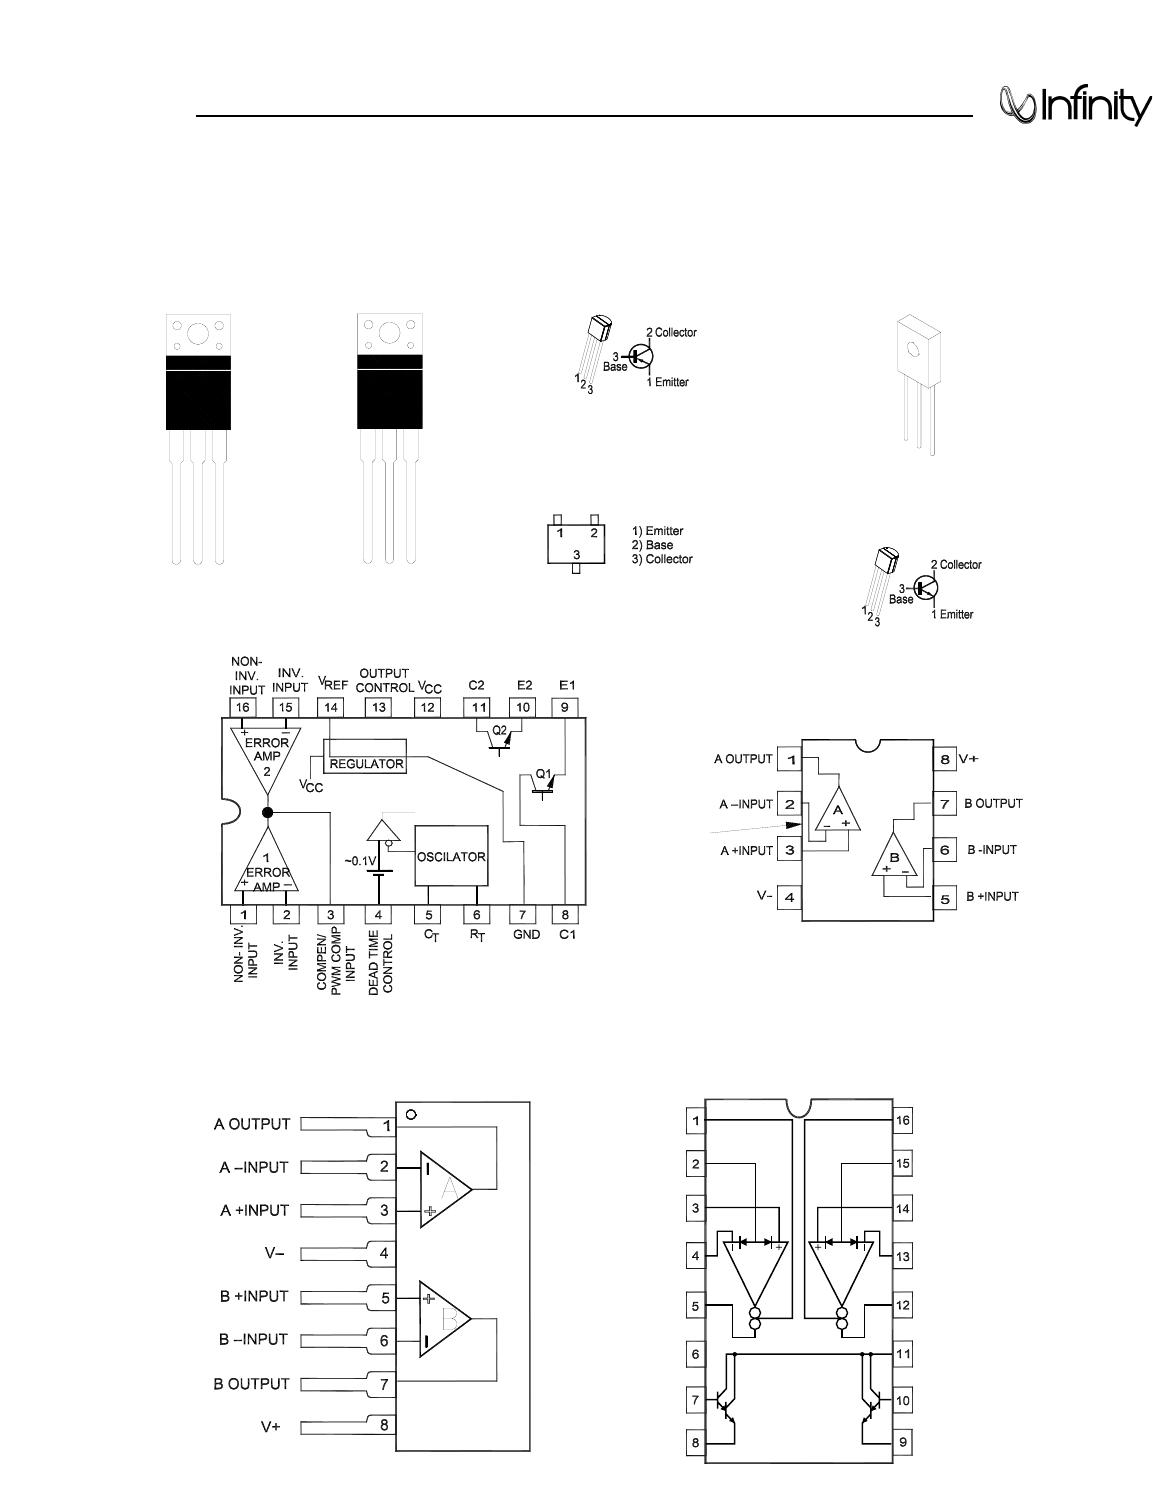 Infinity bass link integrated circuit diagrams